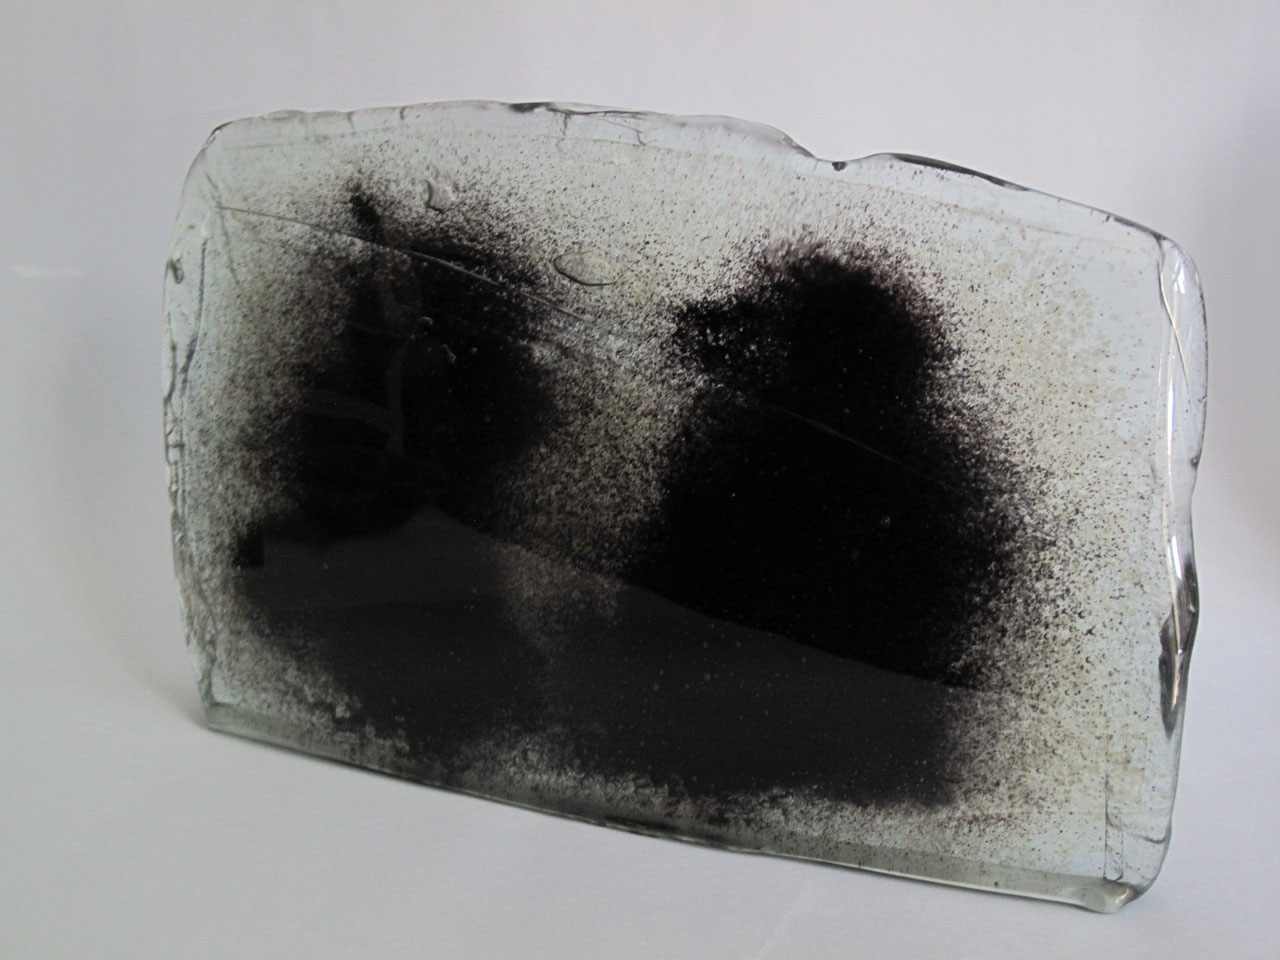 sculptures en verre glass fusing jean pierre deguillemenot cr ateur verrier plasticien. Black Bedroom Furniture Sets. Home Design Ideas